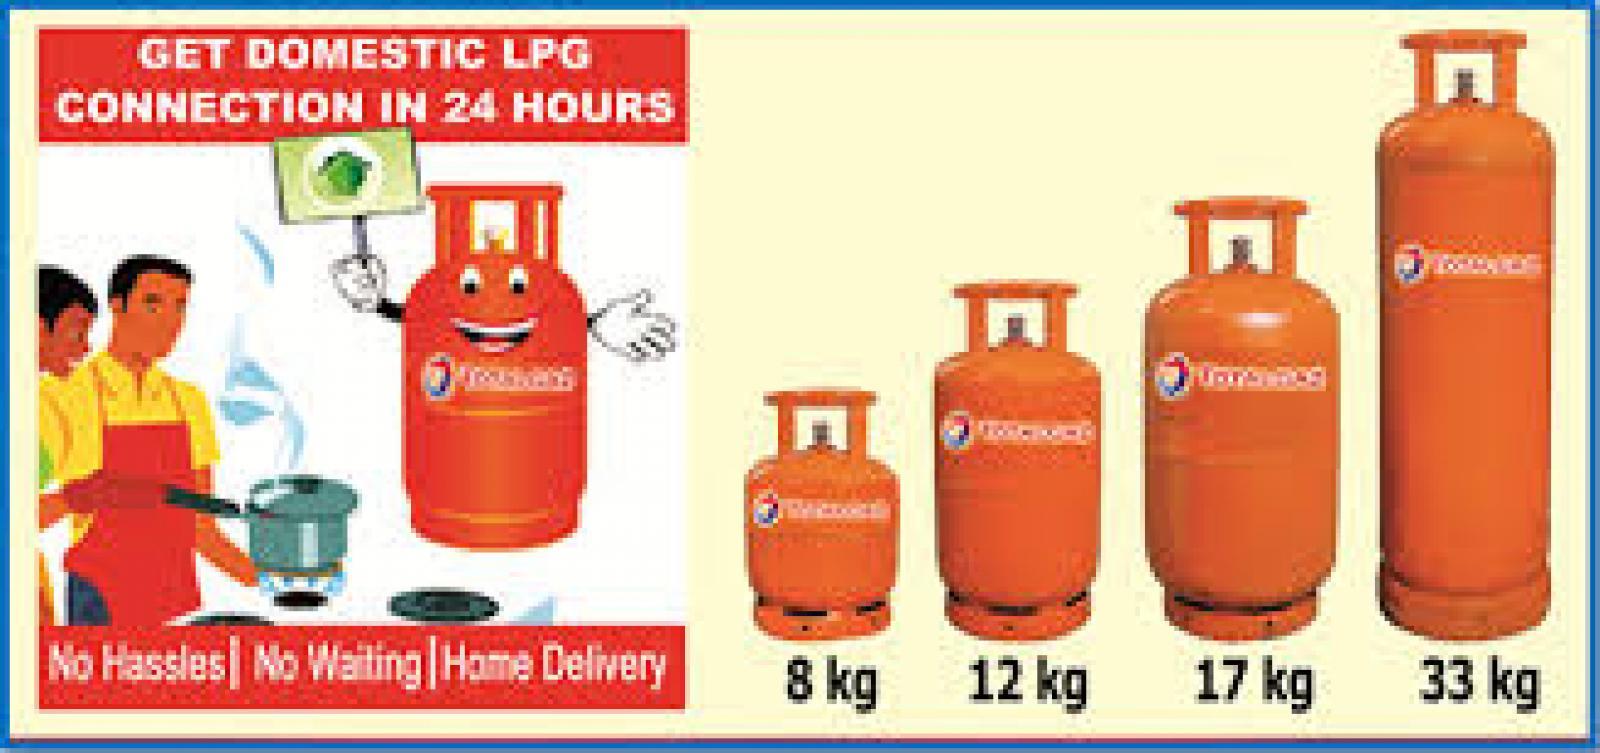 Bhrugu Gas Company